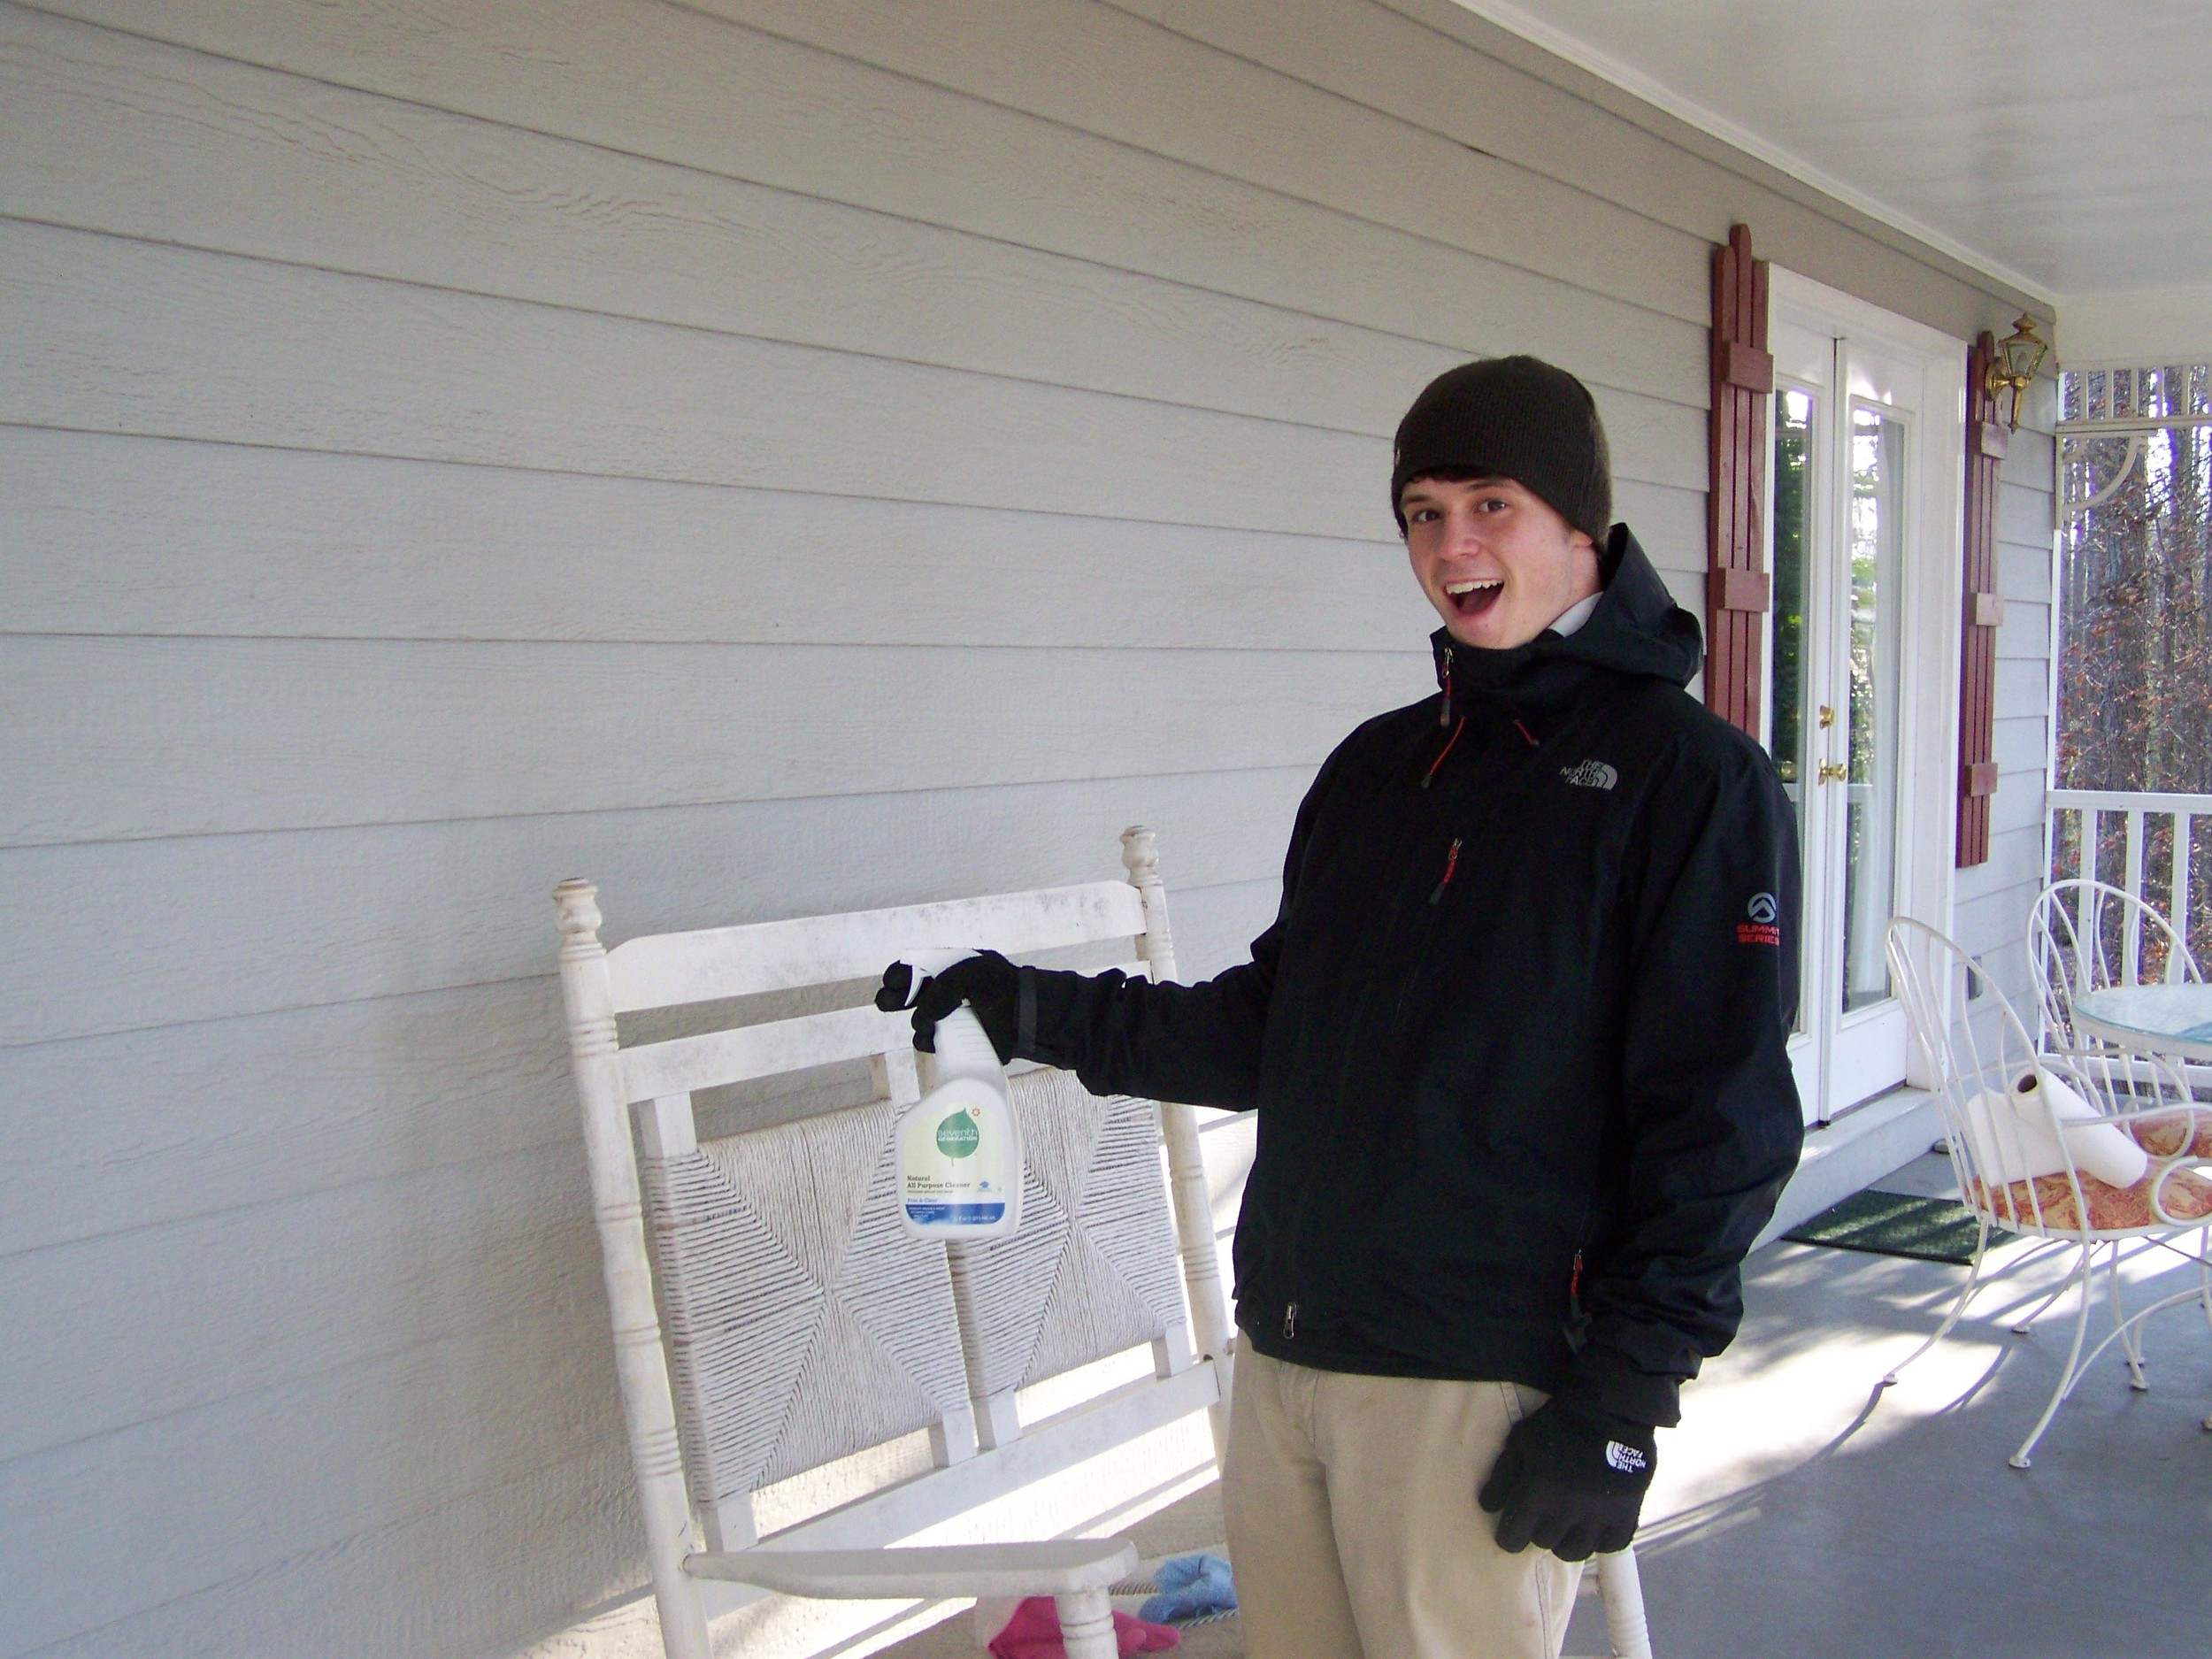 08 Porch furniture 100_8880.JPG